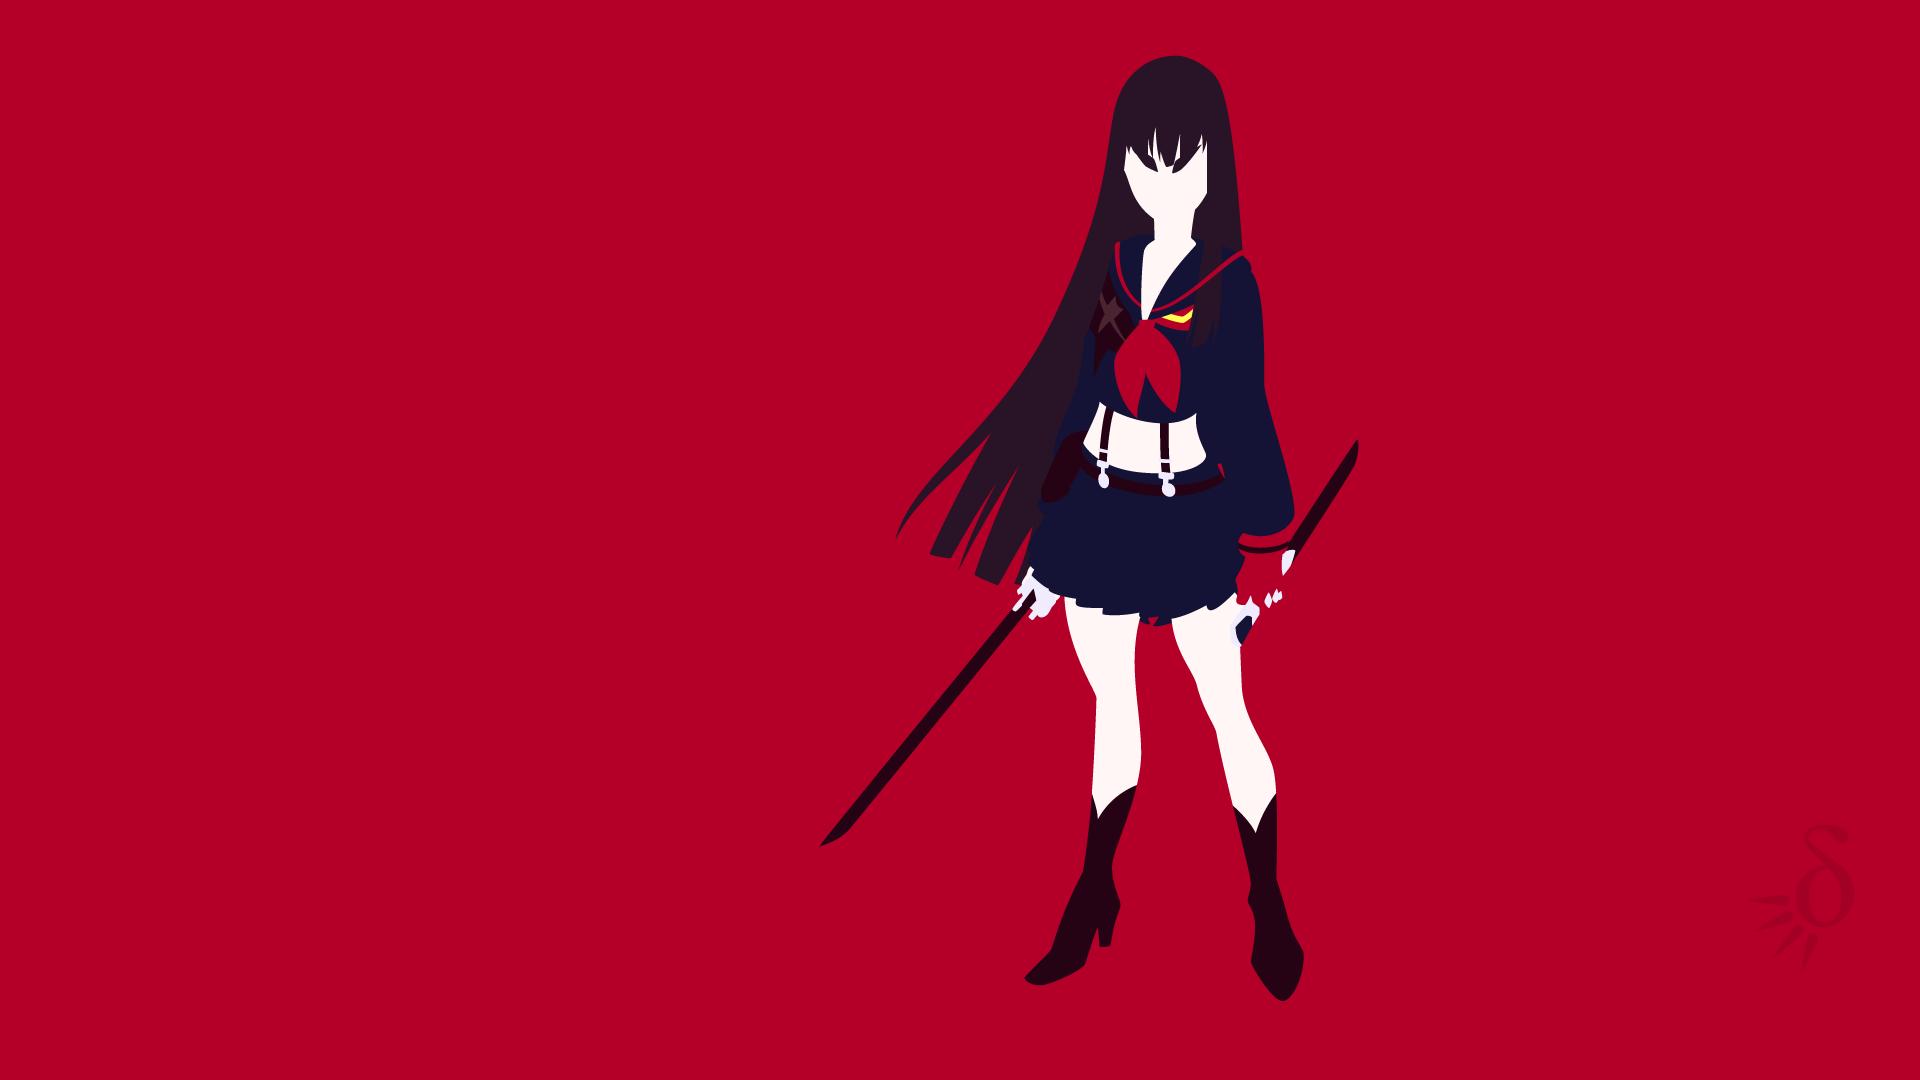 Wallpaper Kill La Kill Kiryuin Satsuki Anime Vectors Anime